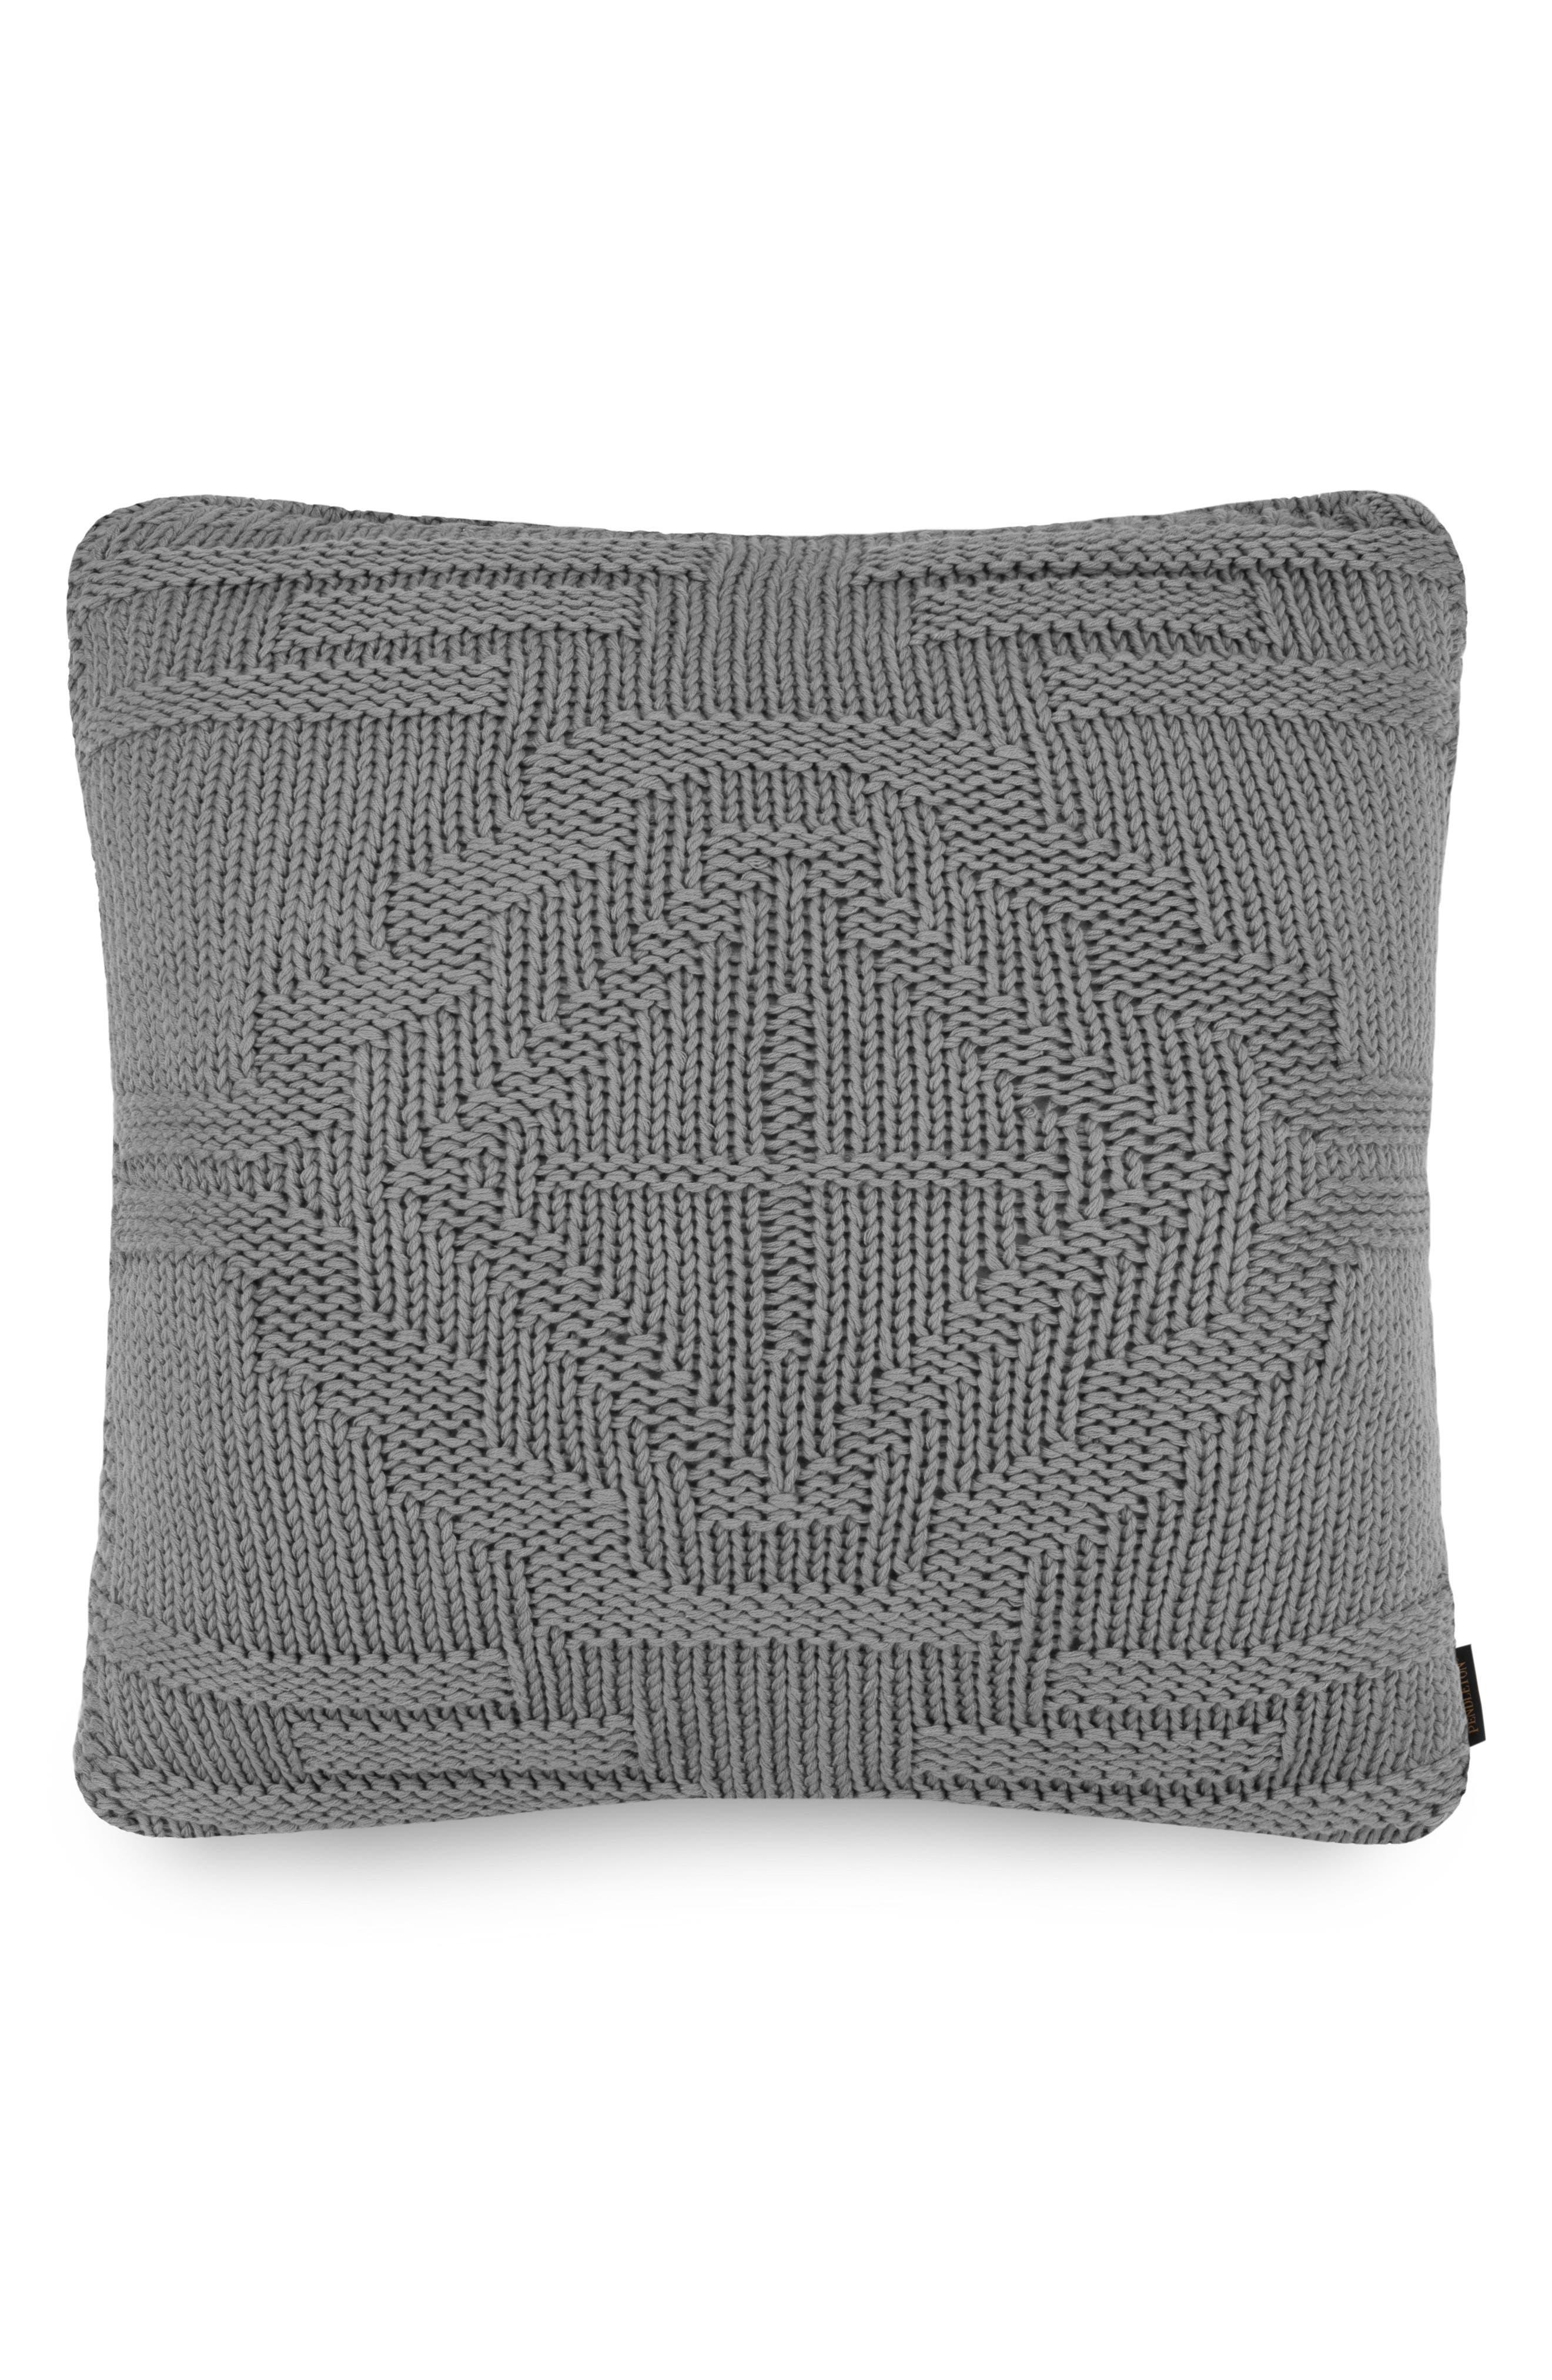 Santa Clara Pillow,                         Main,                         color,